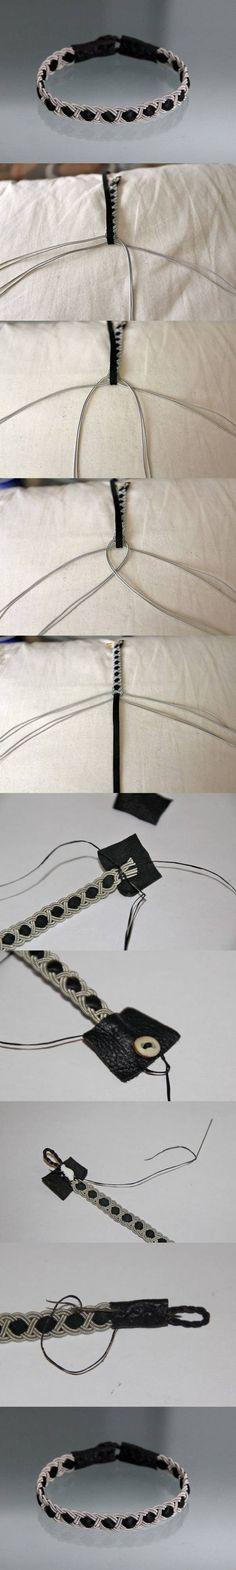 DIY可爱手绳